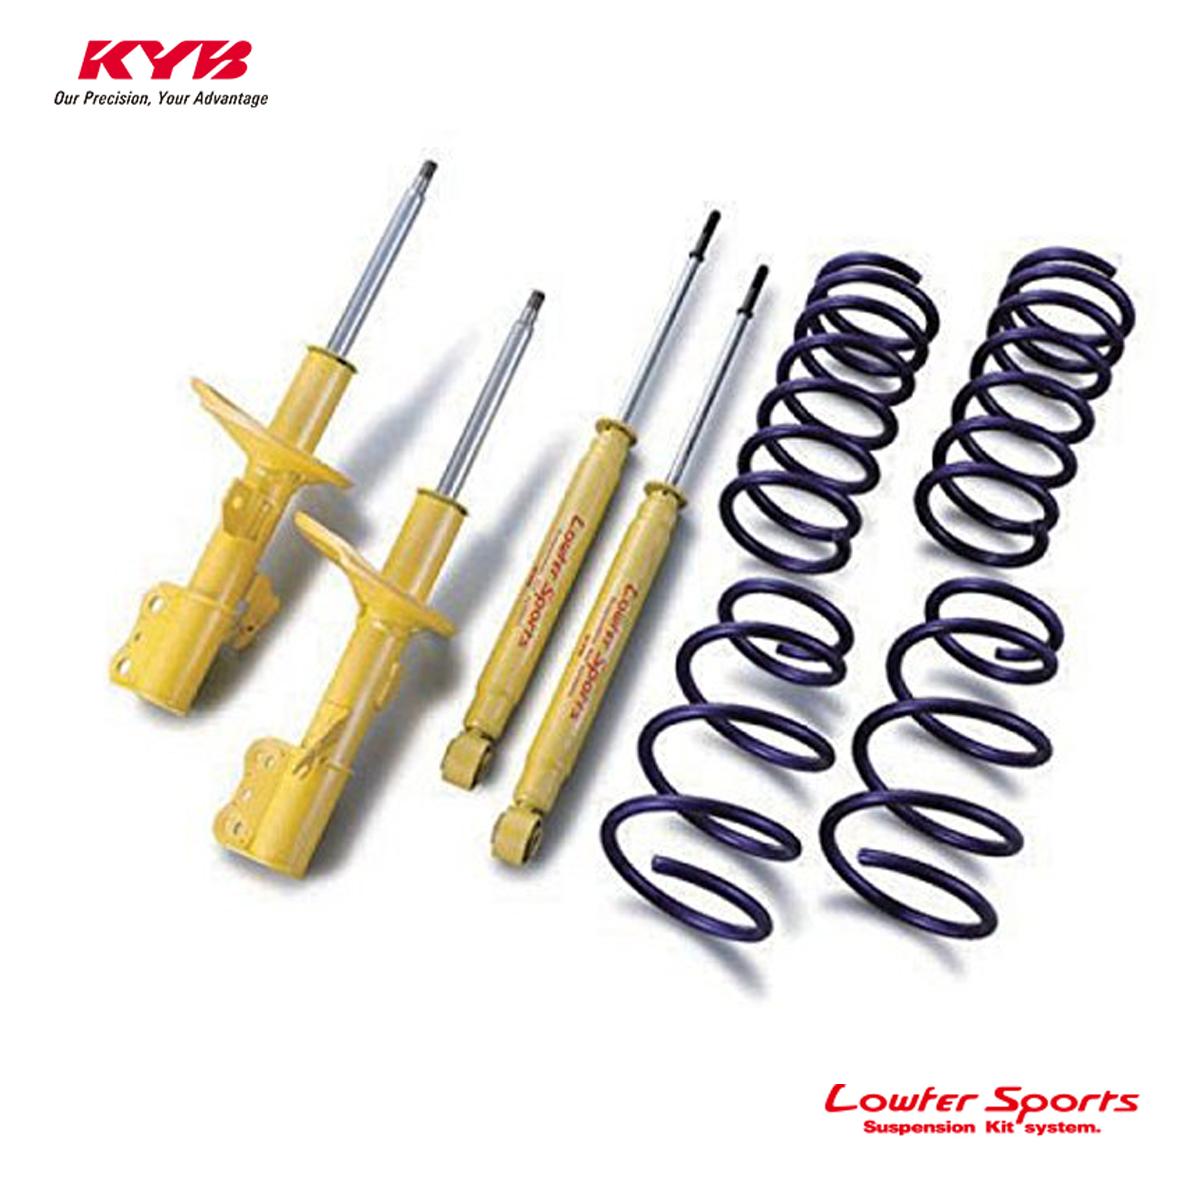 KYB カヤバ モコ MG21S ショックアブソーバー サスペンションキット Lowfer Sports LKIT-MF21S 配送先条件有り